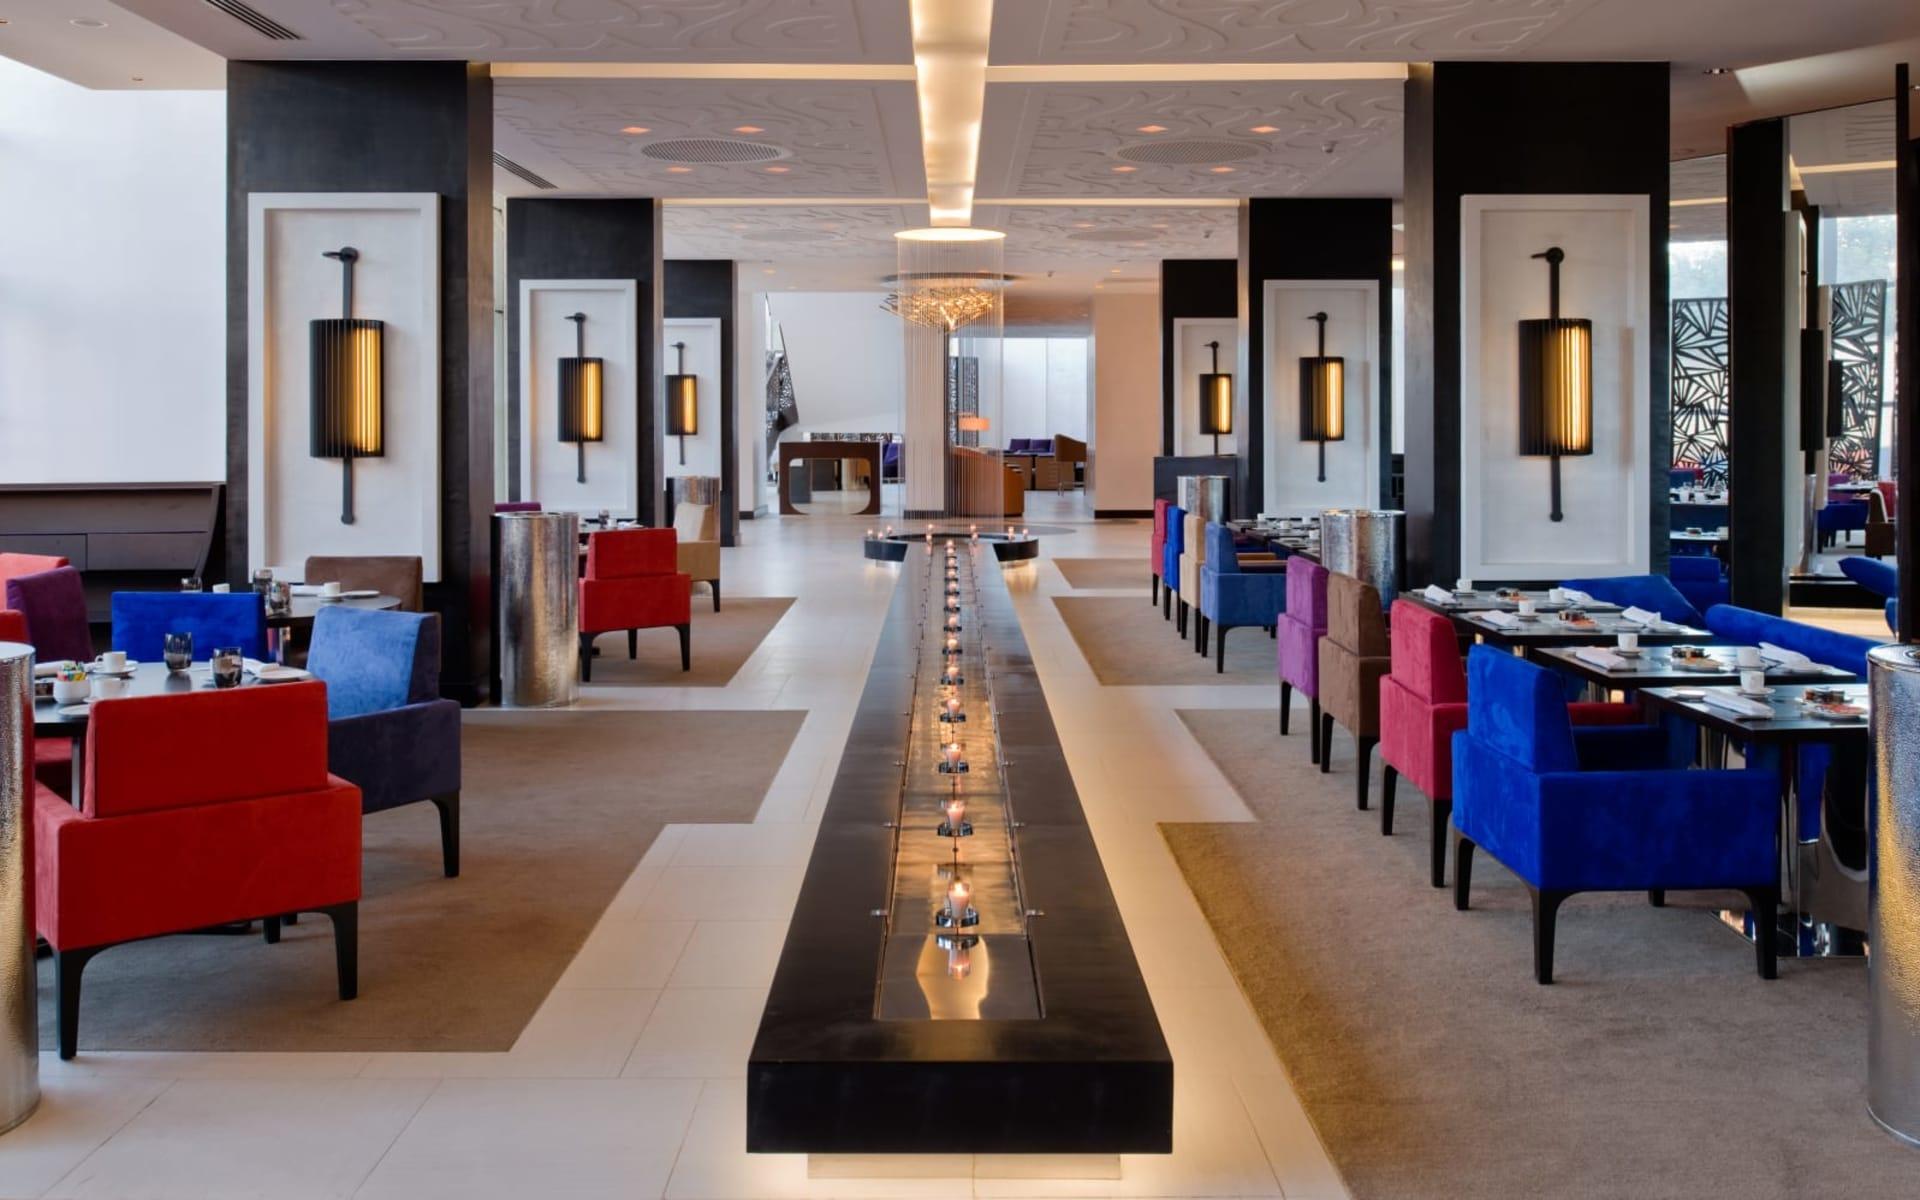 Sofitel Casablanca Tour Blanche: Restaurant Brasserie La Tour